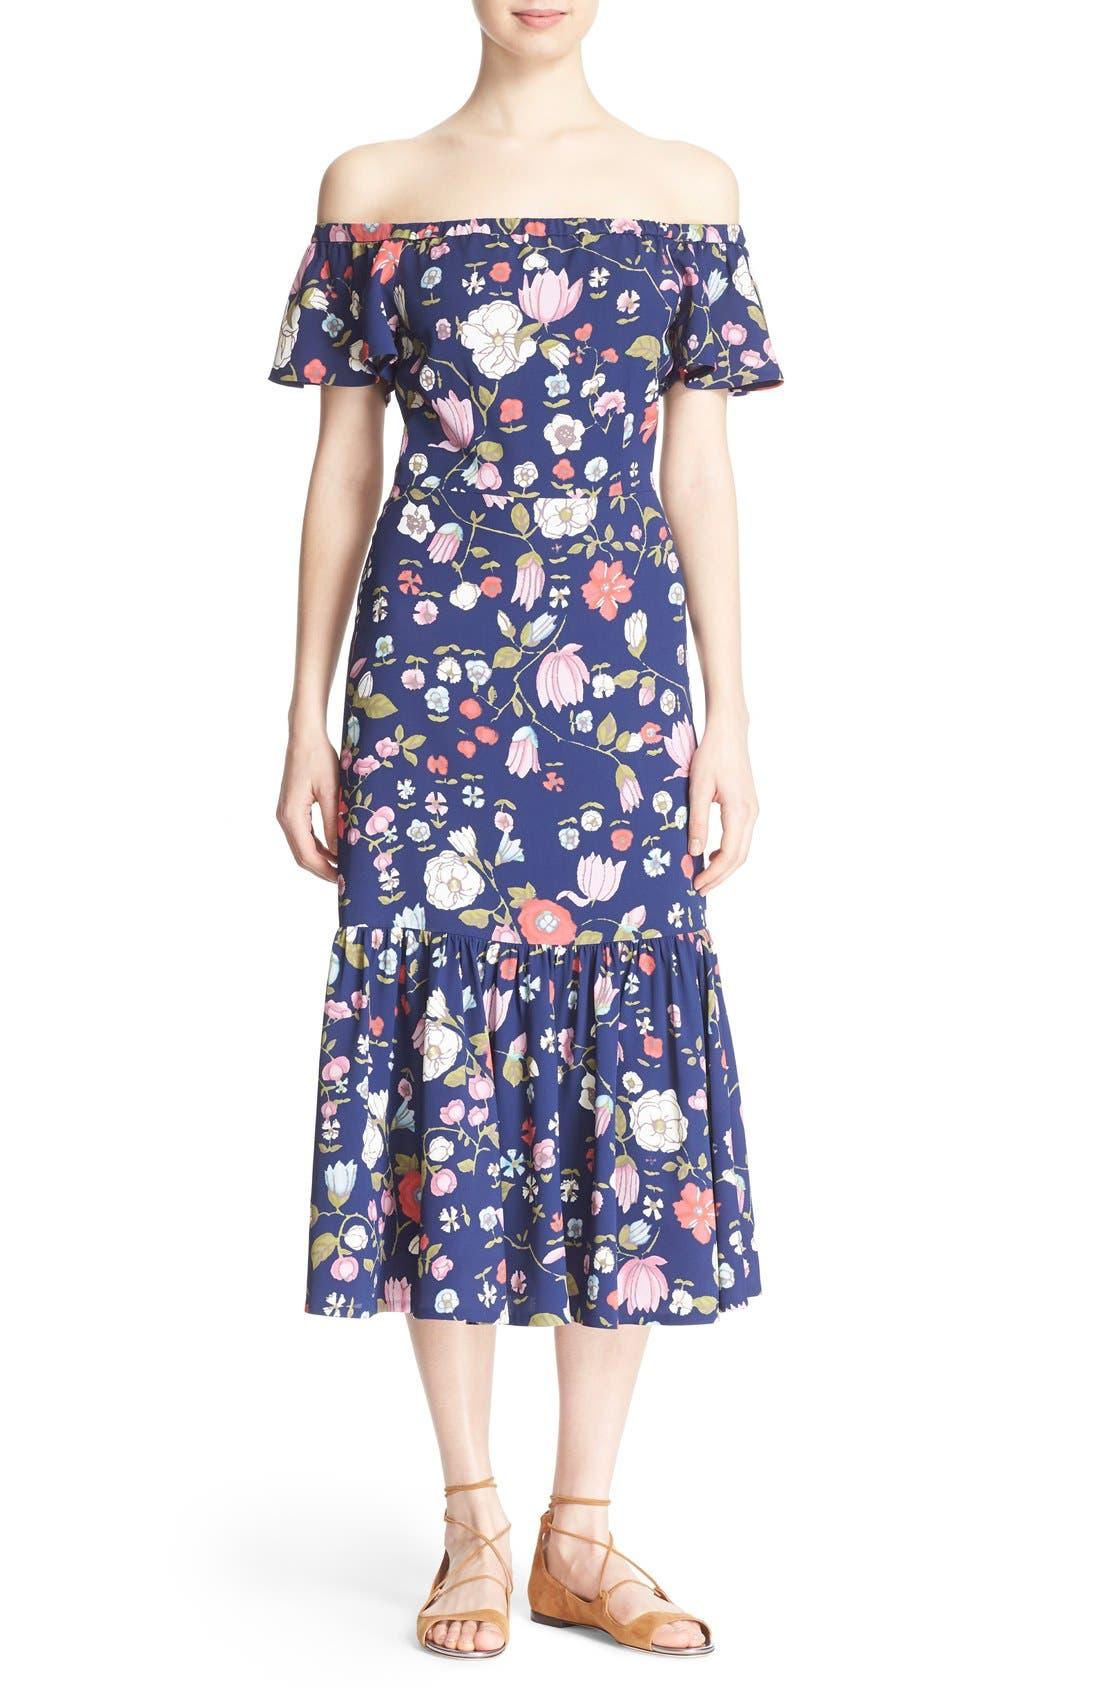 REBECCA TAYLOR Off the Shoulder Floral Print Dress, Main, color, 510